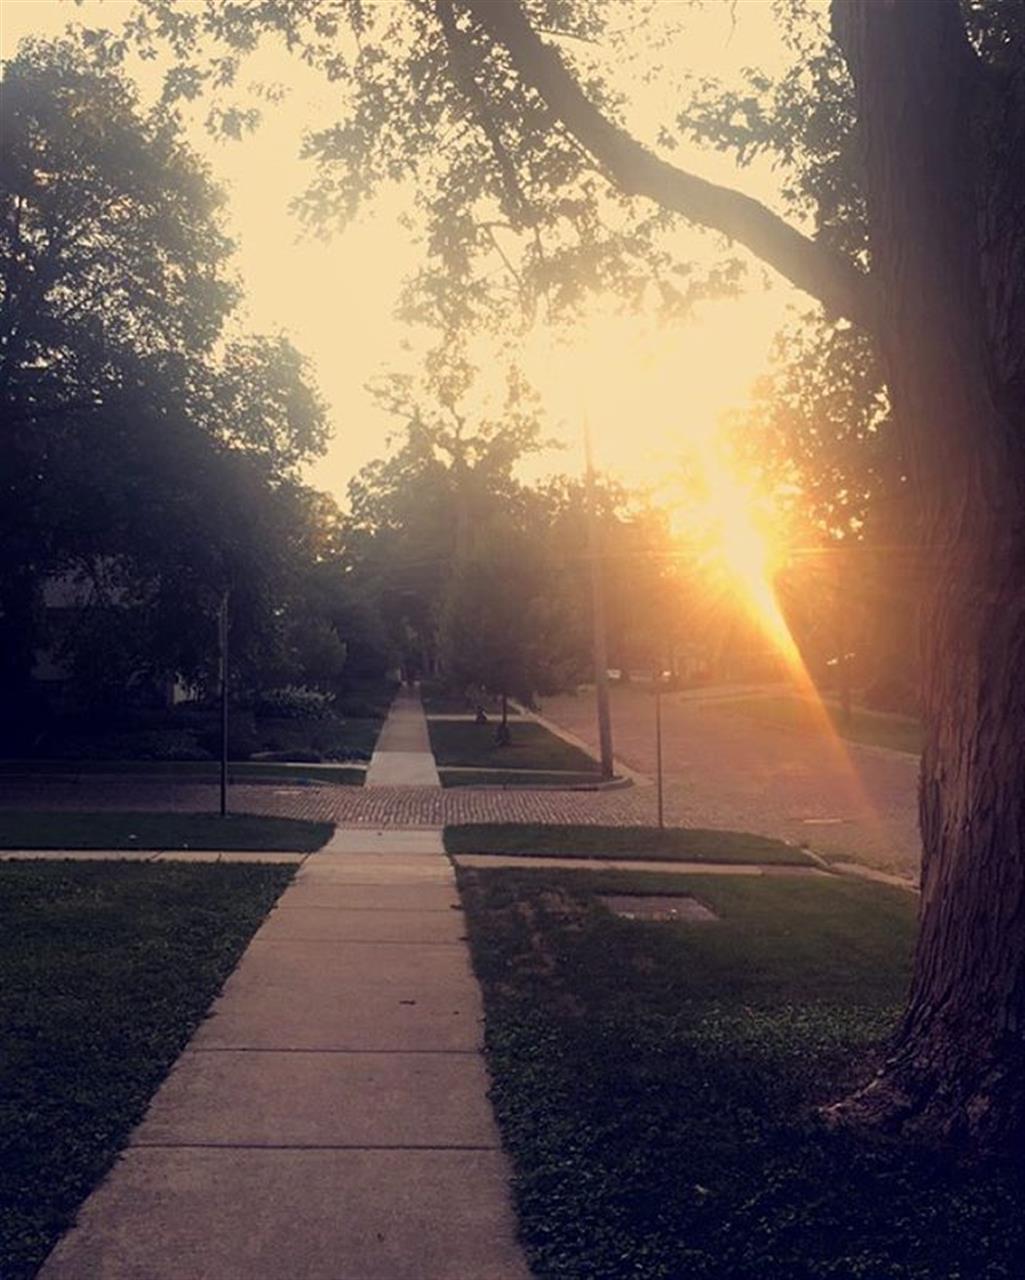 Memories of warm walks through warm nights. #summernights #dupagecounty #downersgrove #bairdwarner #leadingrelocal #chicagosuburbs #chicagoland